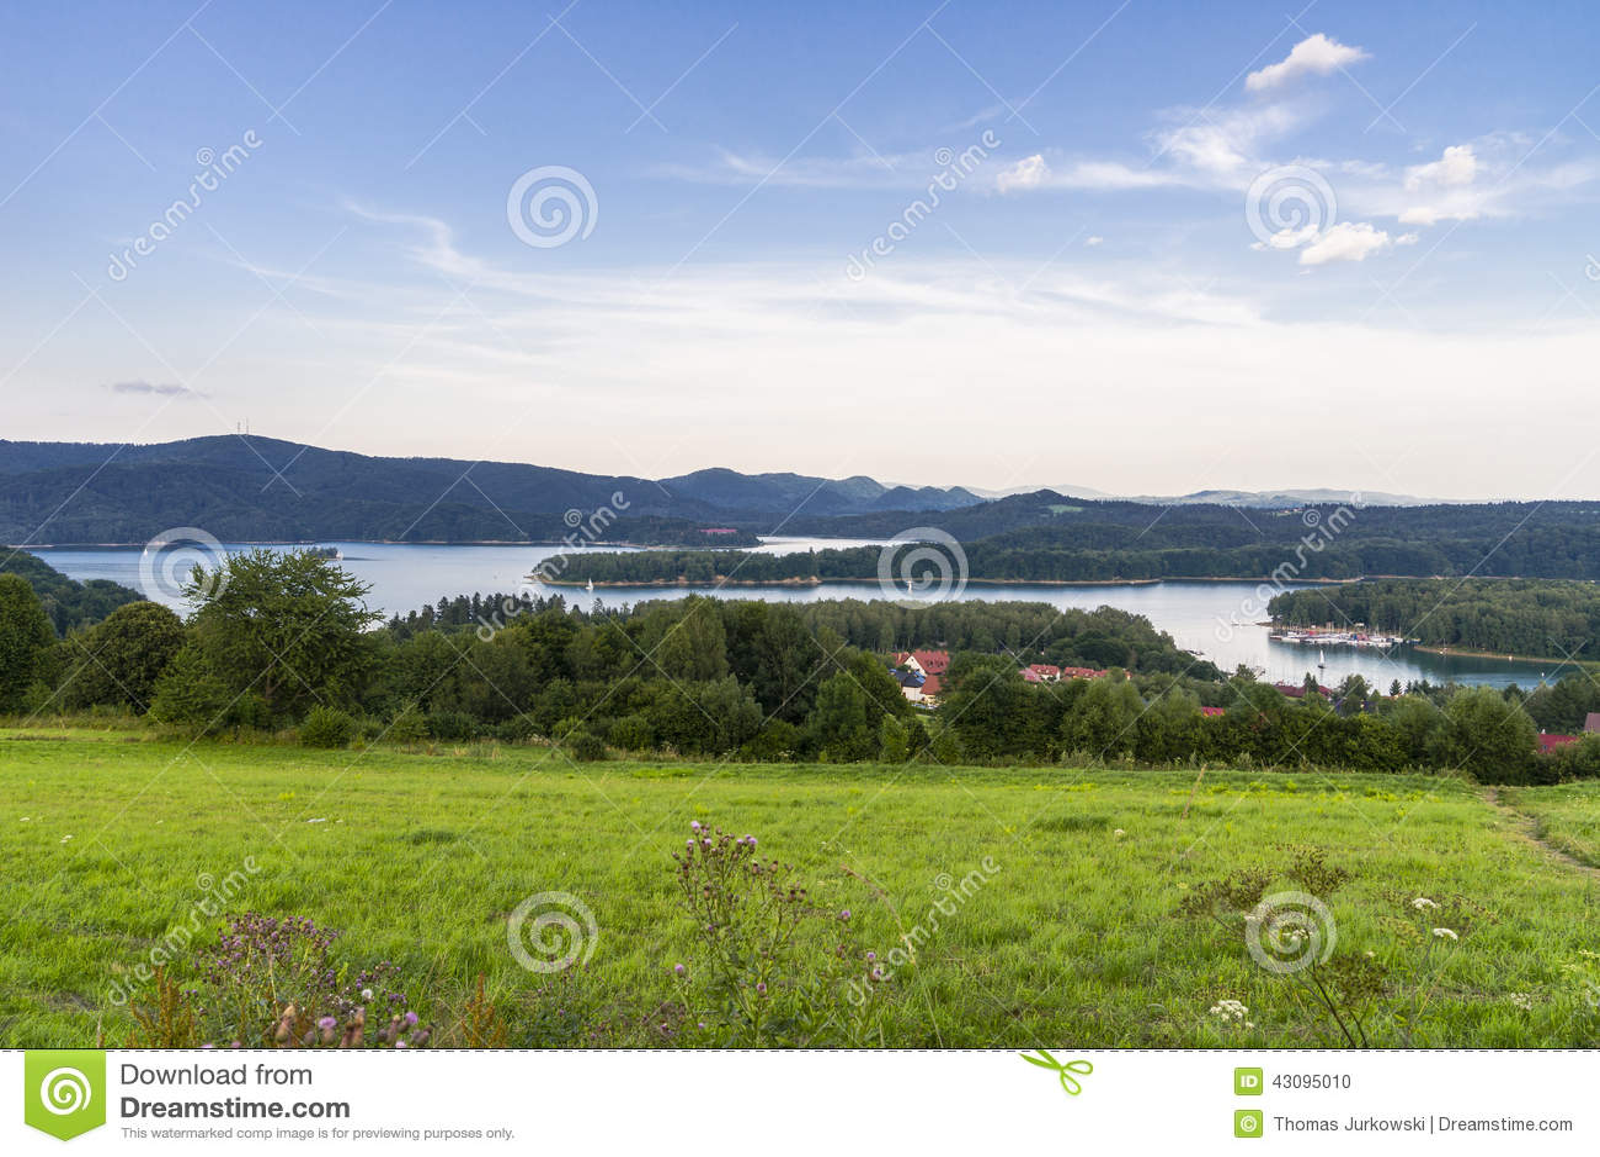 Panorama von See